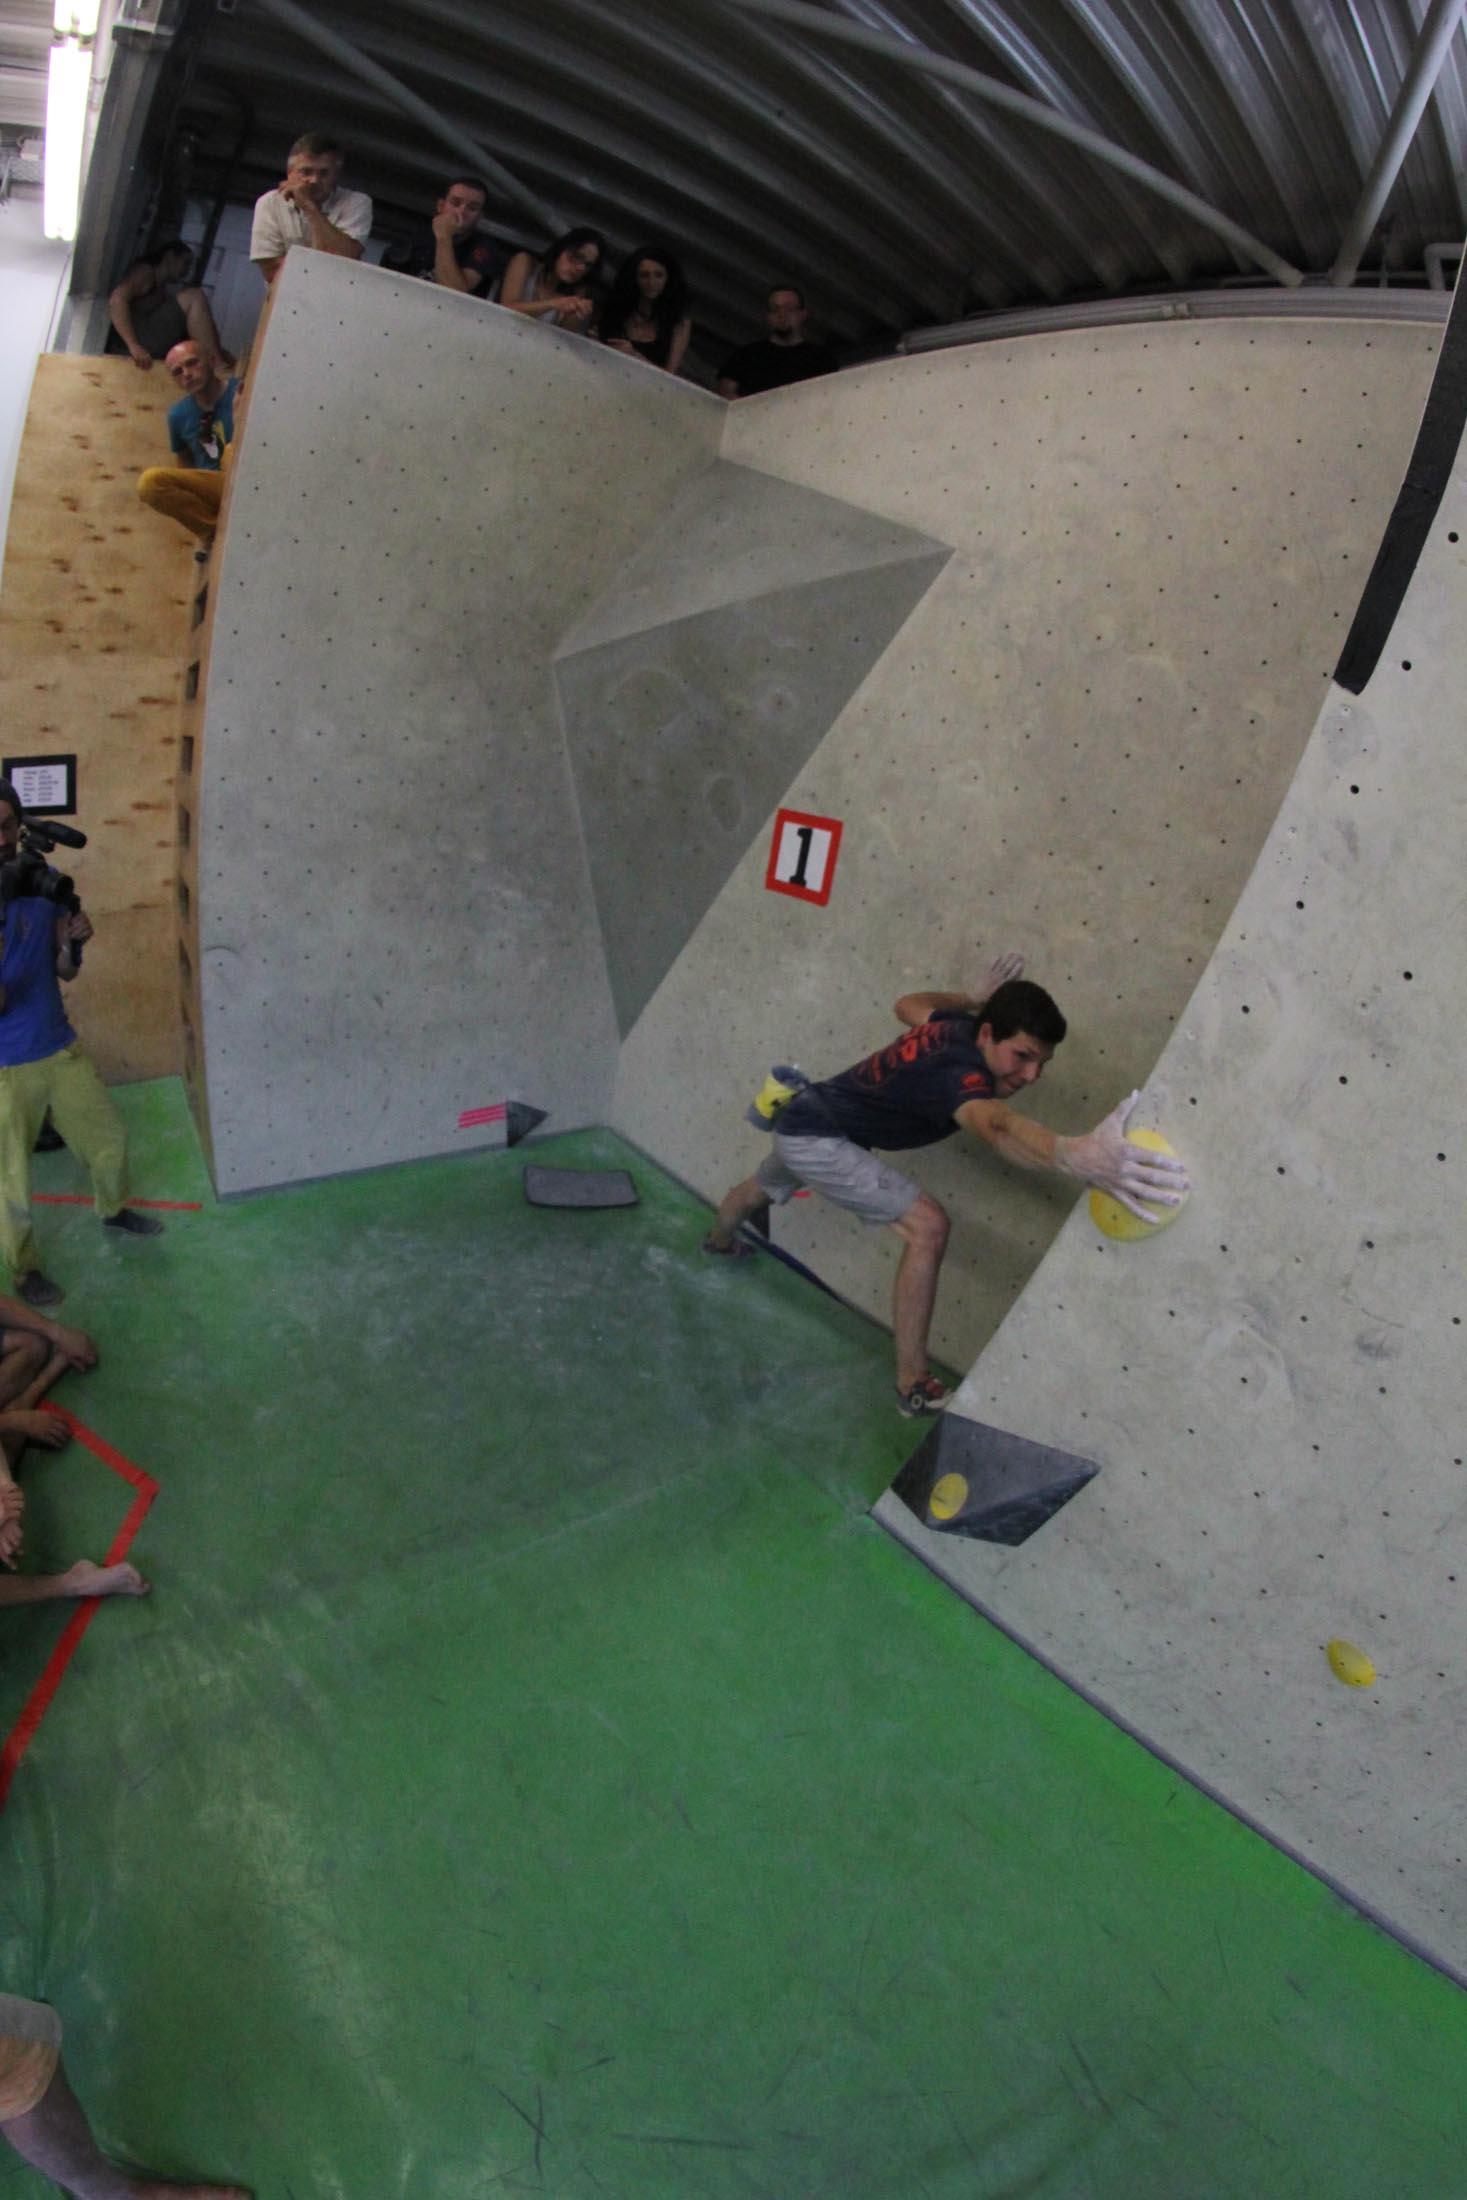 Finale, internationaler bouldercup Frankenjura 2016, BLOCKHELDEN Erlangen, Mammut, Bergfreunde.de, Boulderwettkampf07092016563